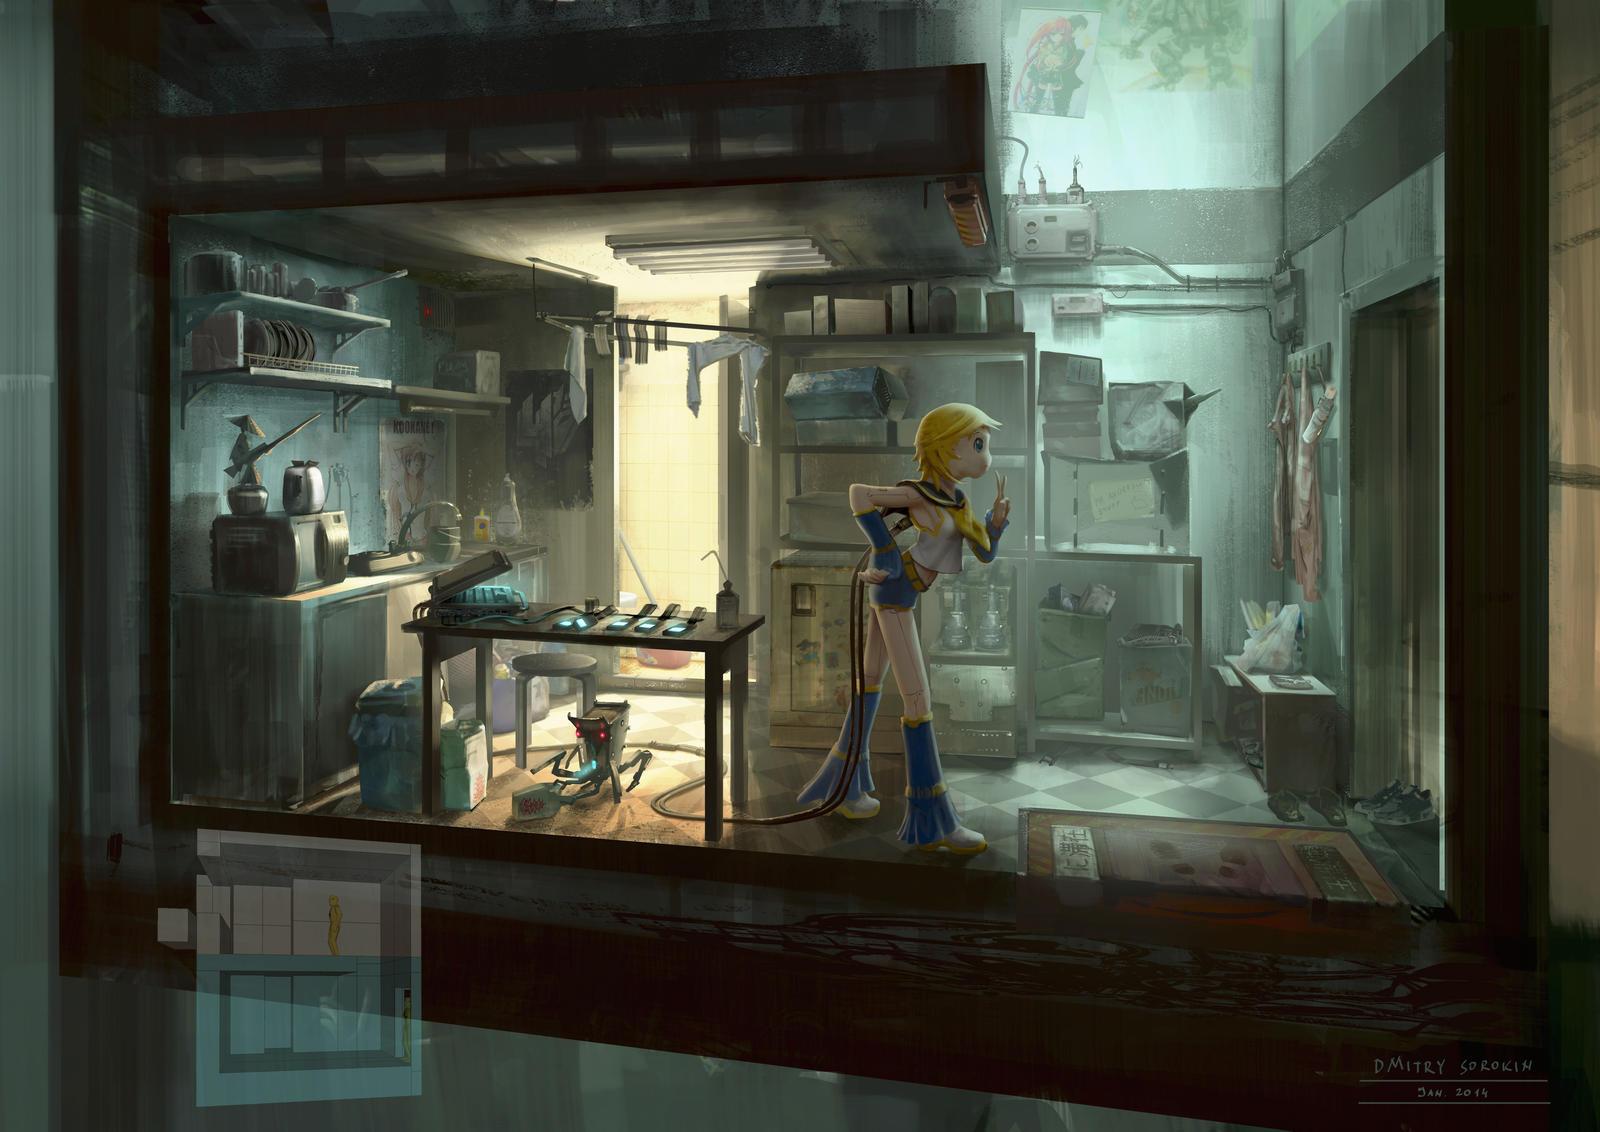 Cyberpunk otaku place kitchen by dsorokin755 on deviantart for Cyberpunk interior design